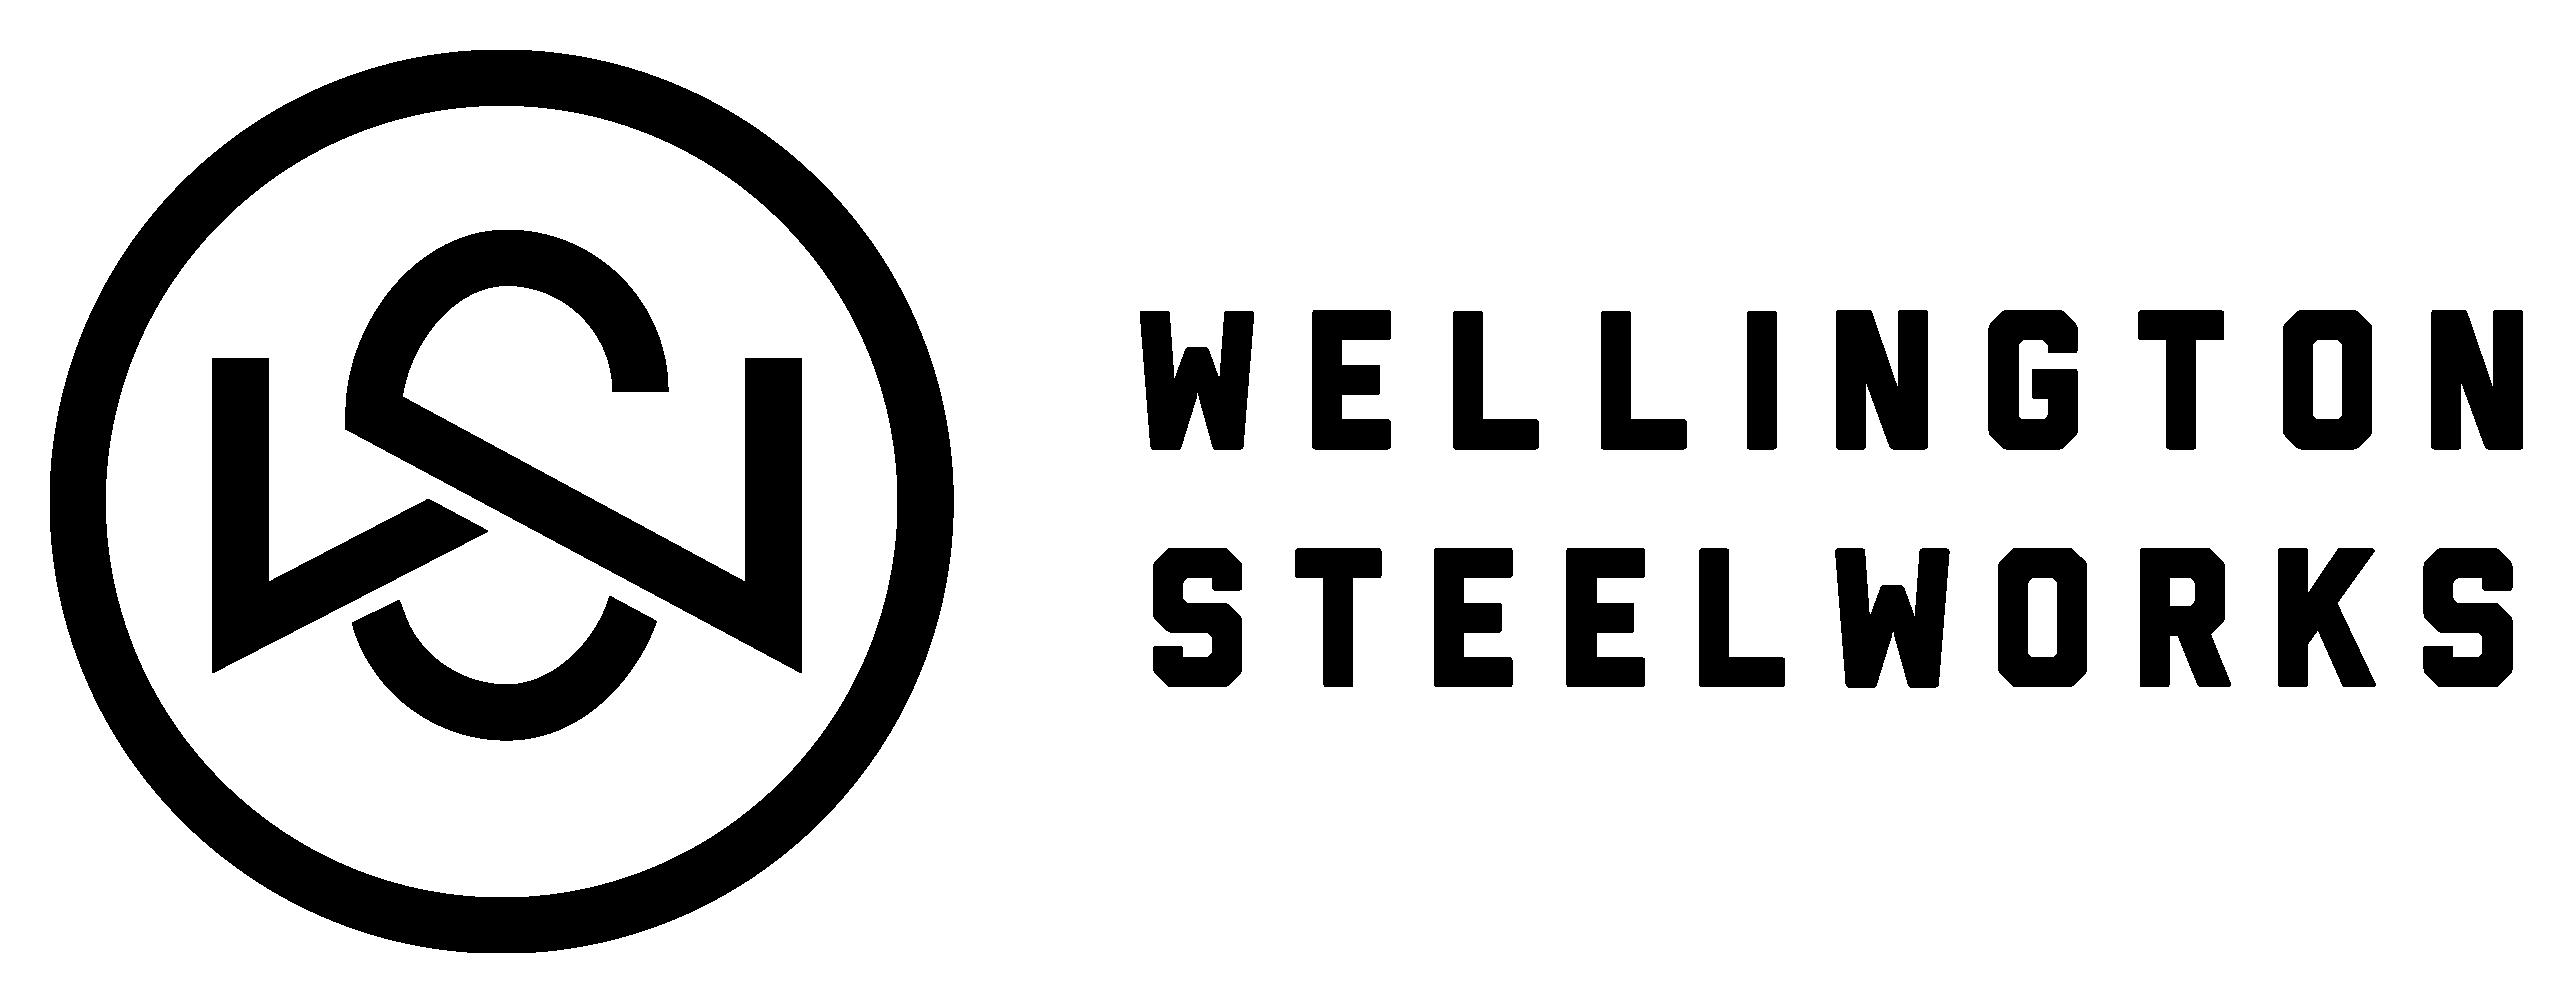 wellington steelworks logo full in black